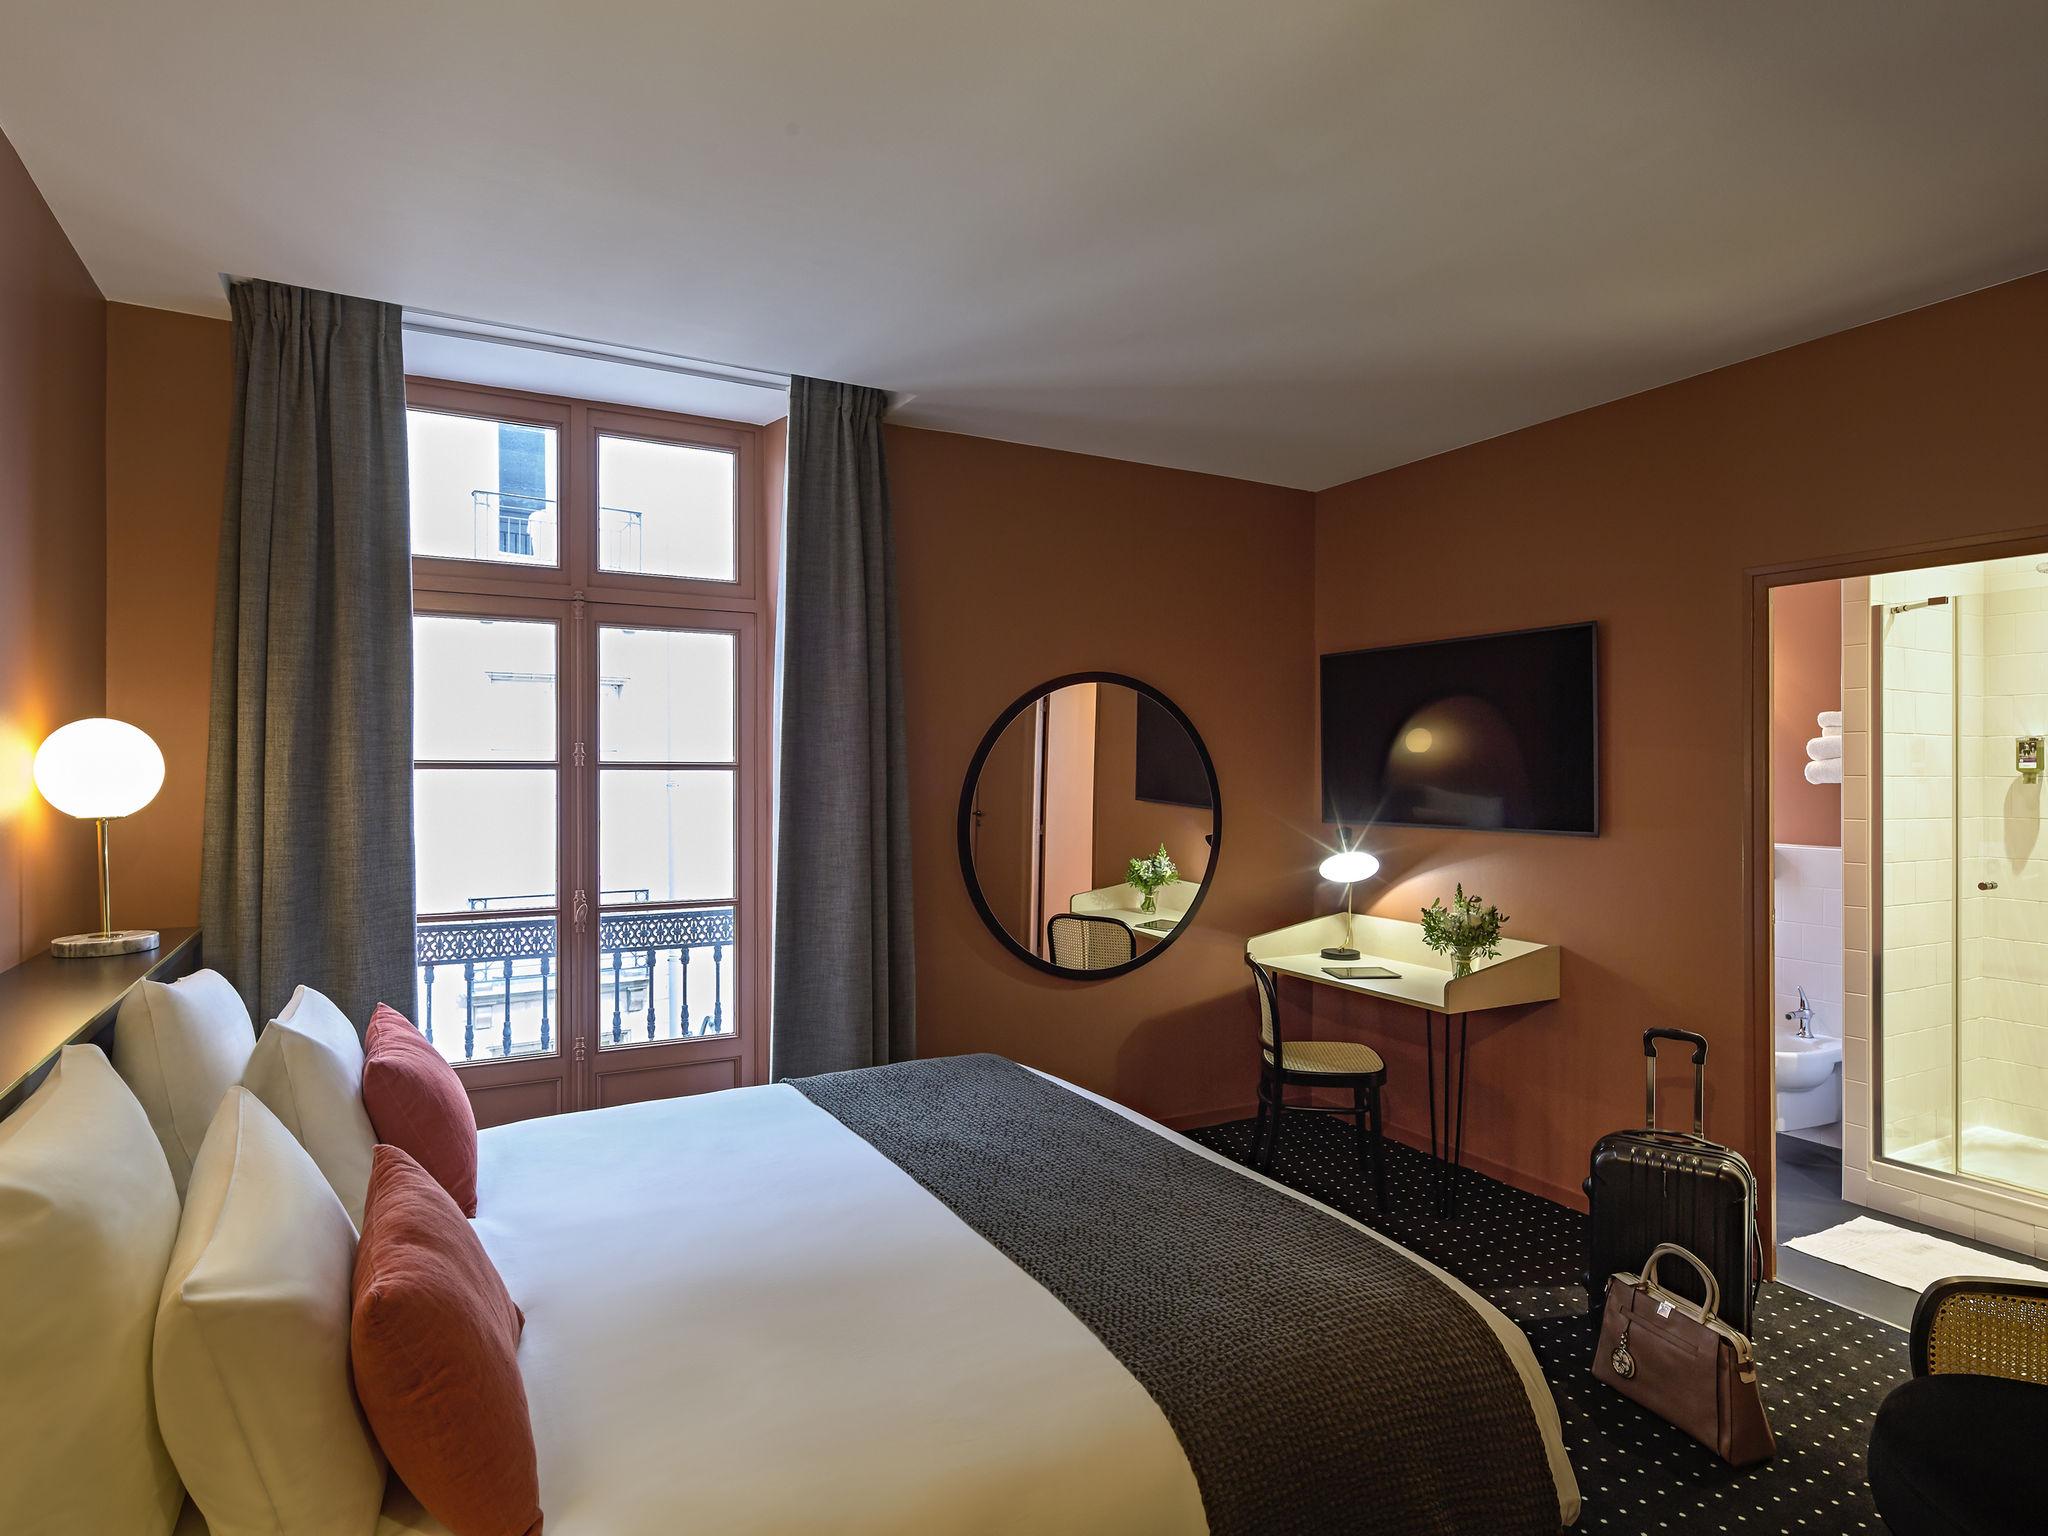 Hôtel - Hôtel Nantes Centre Passage Pommeraye